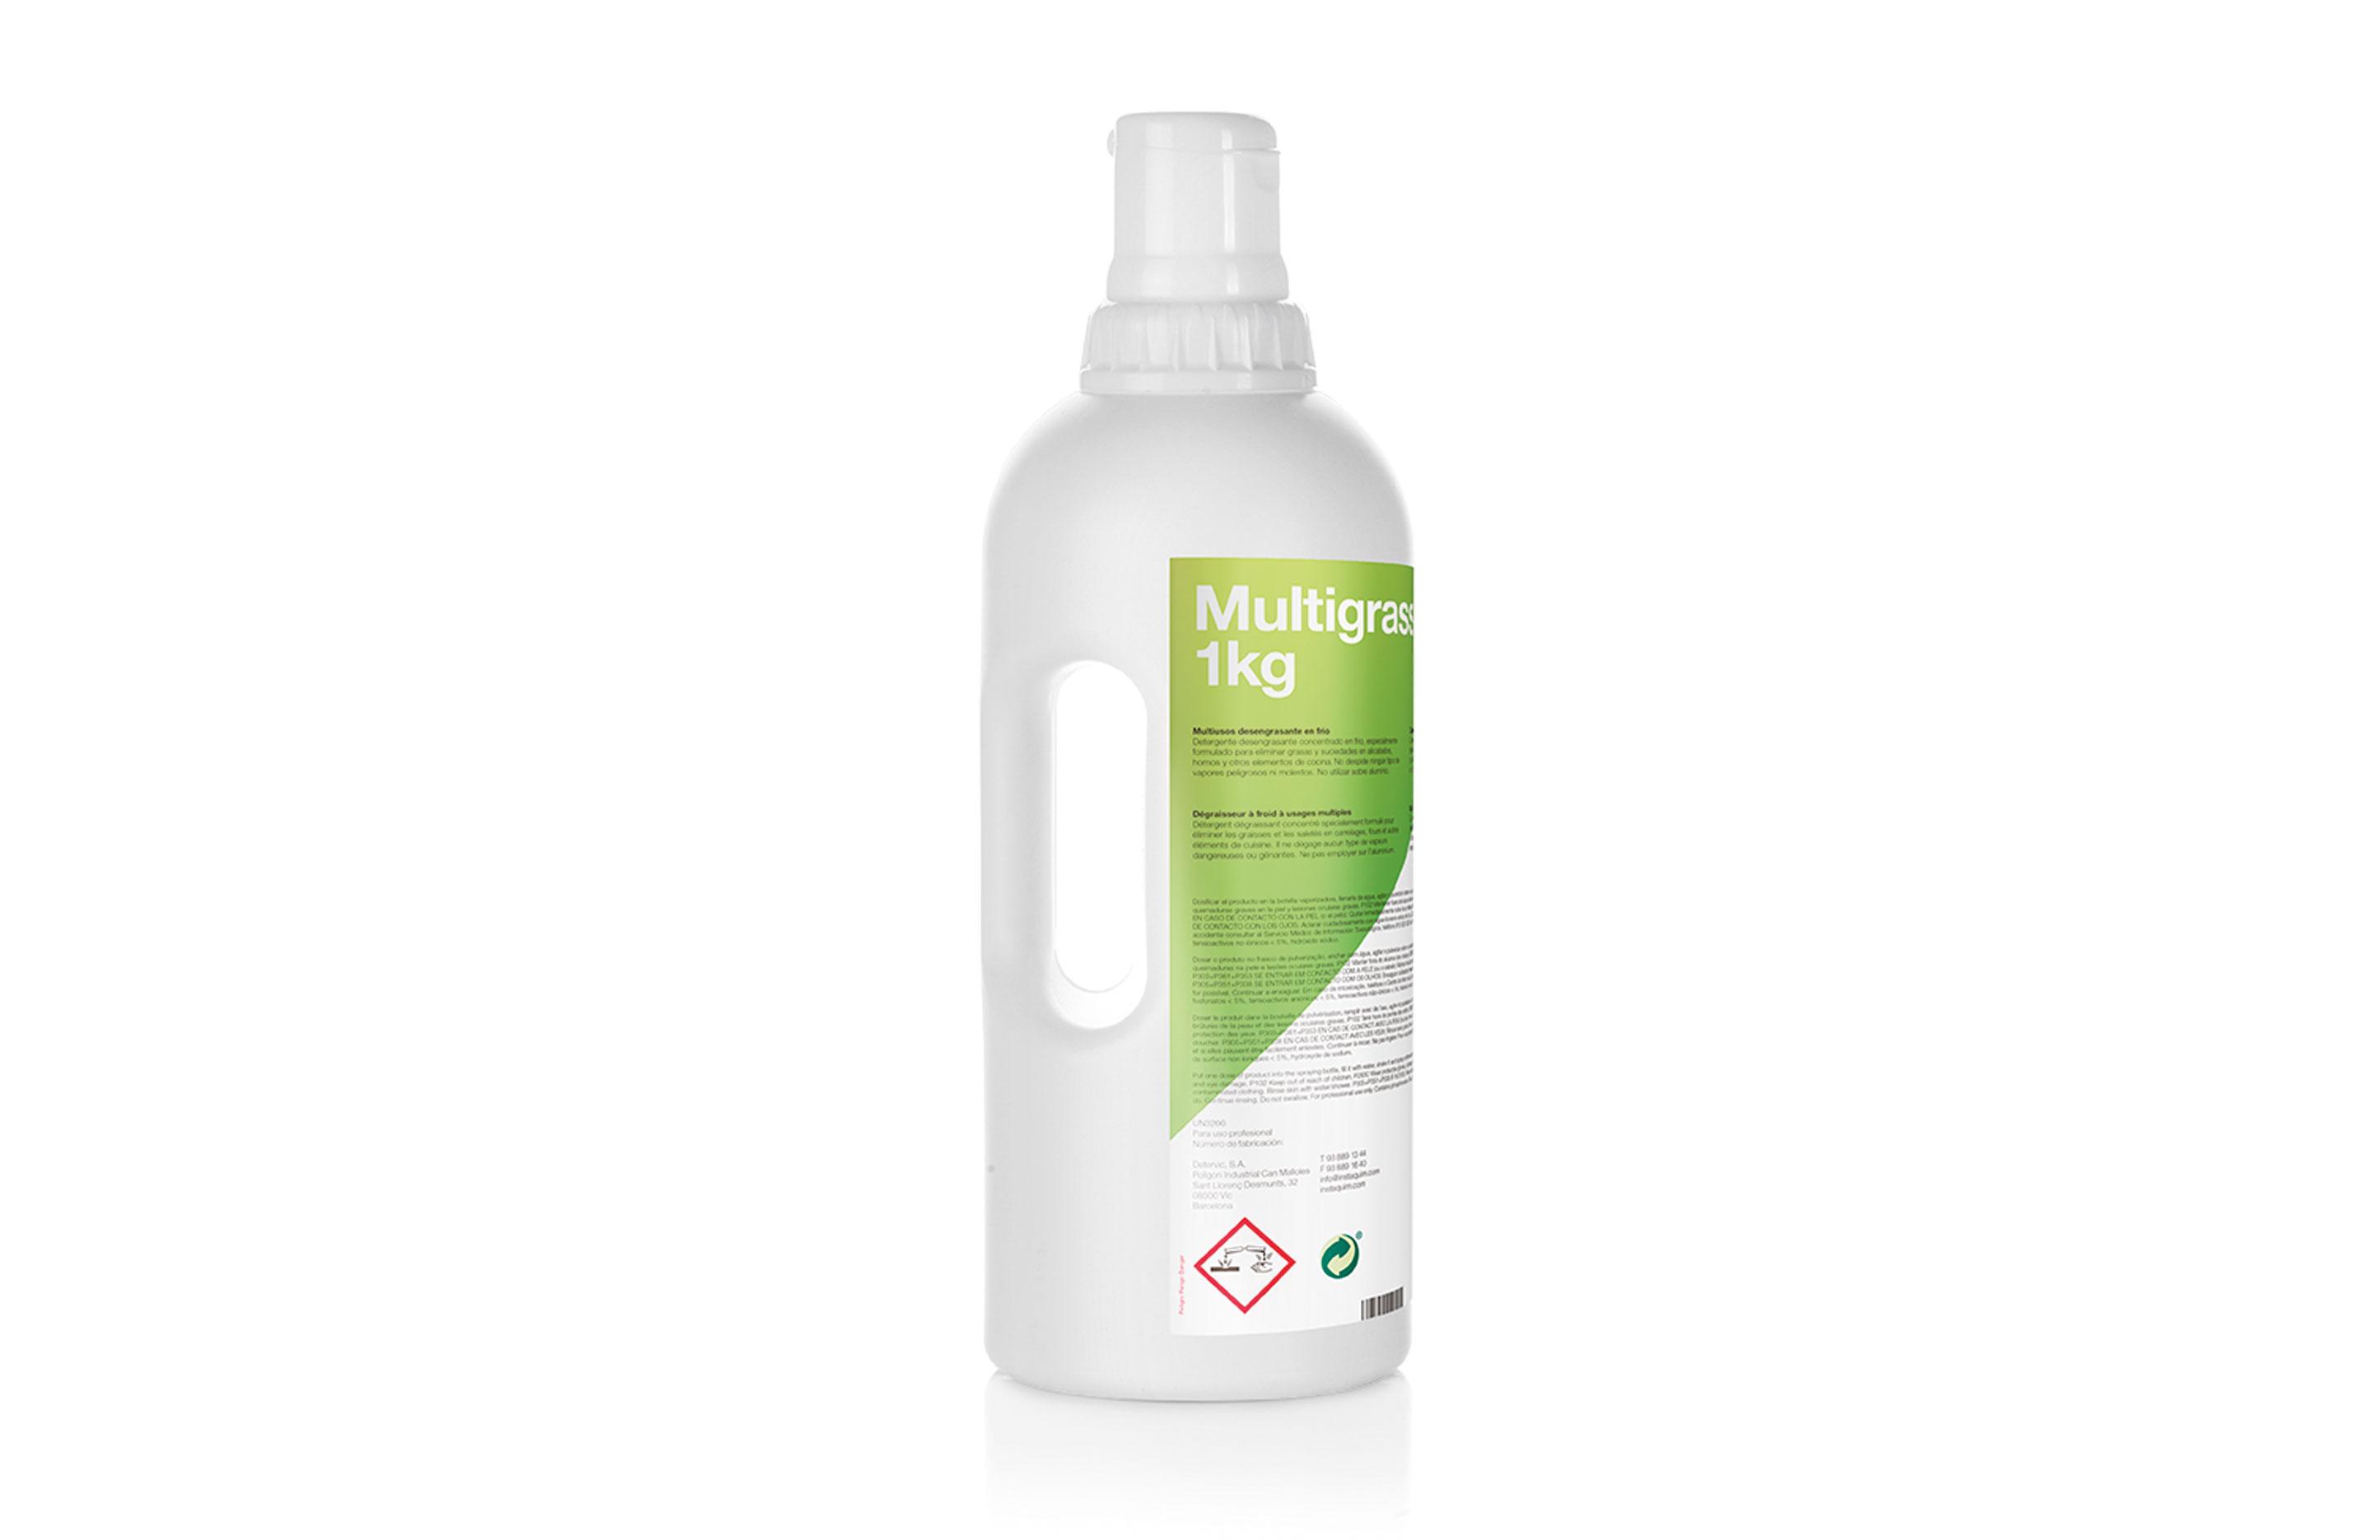 Multigrass, multiusos desengrasante en frío - Autodosis.